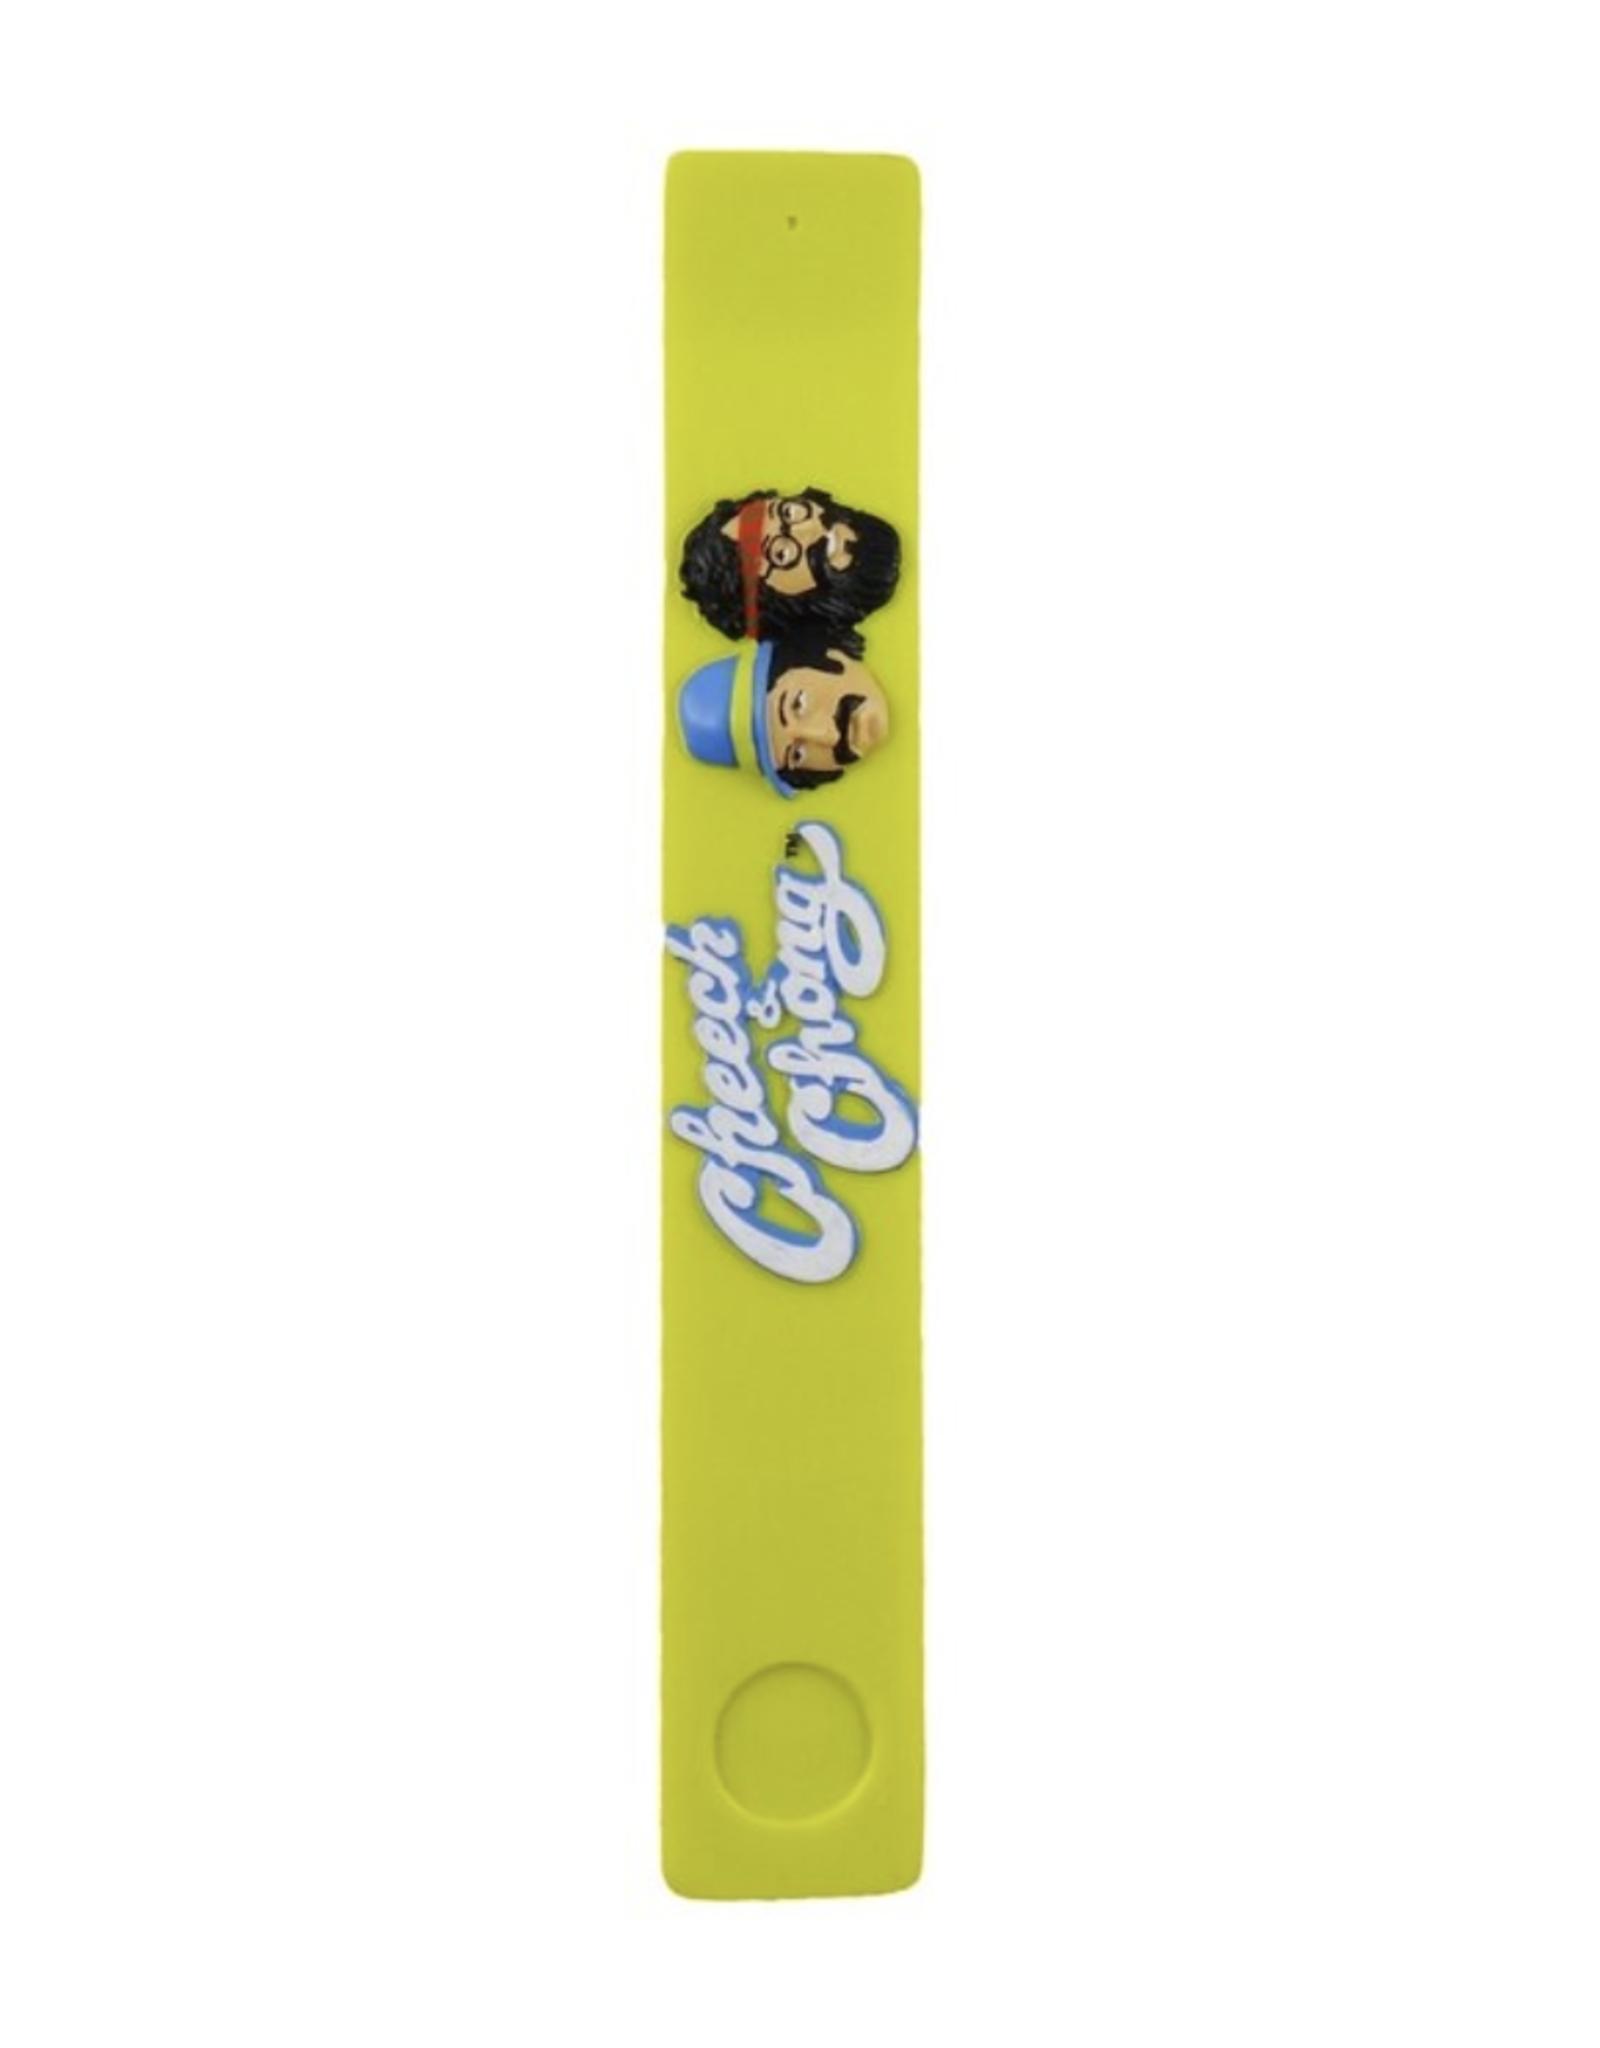 Cheech & Chong Incense Burner - Yellow